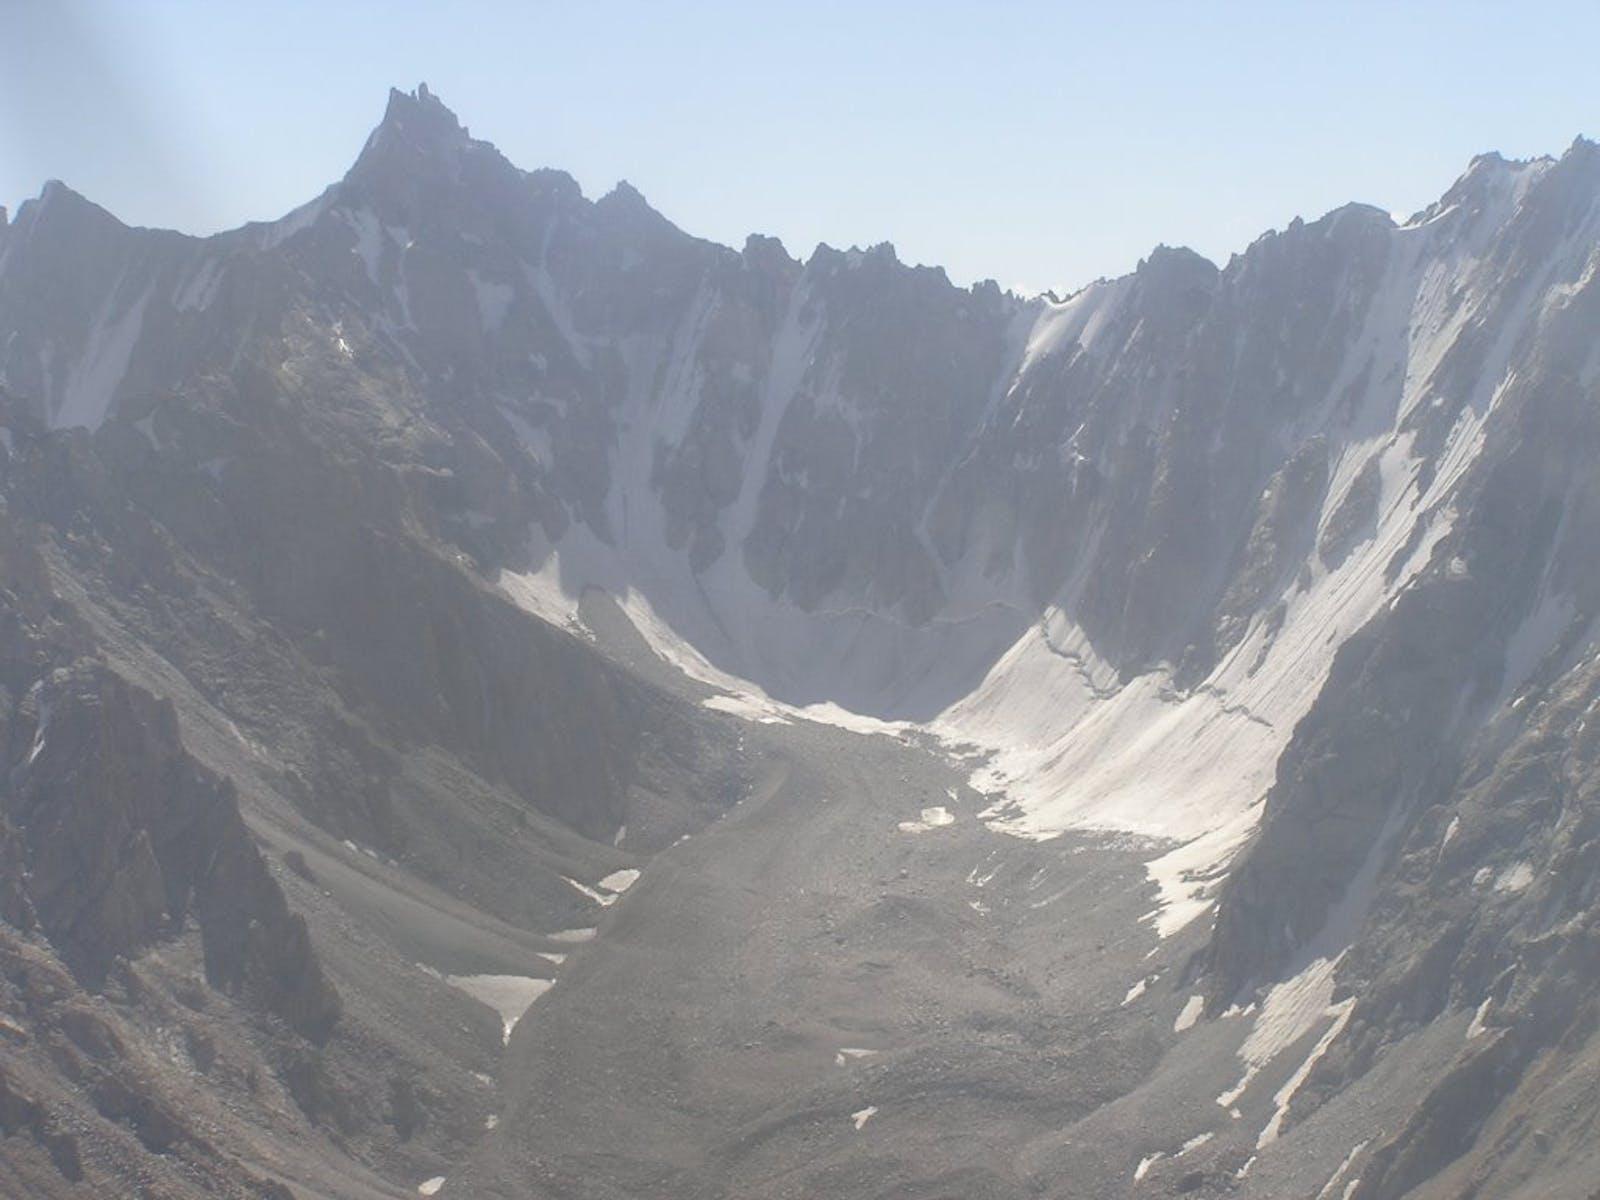 Hindu Kush Alpine Meadow